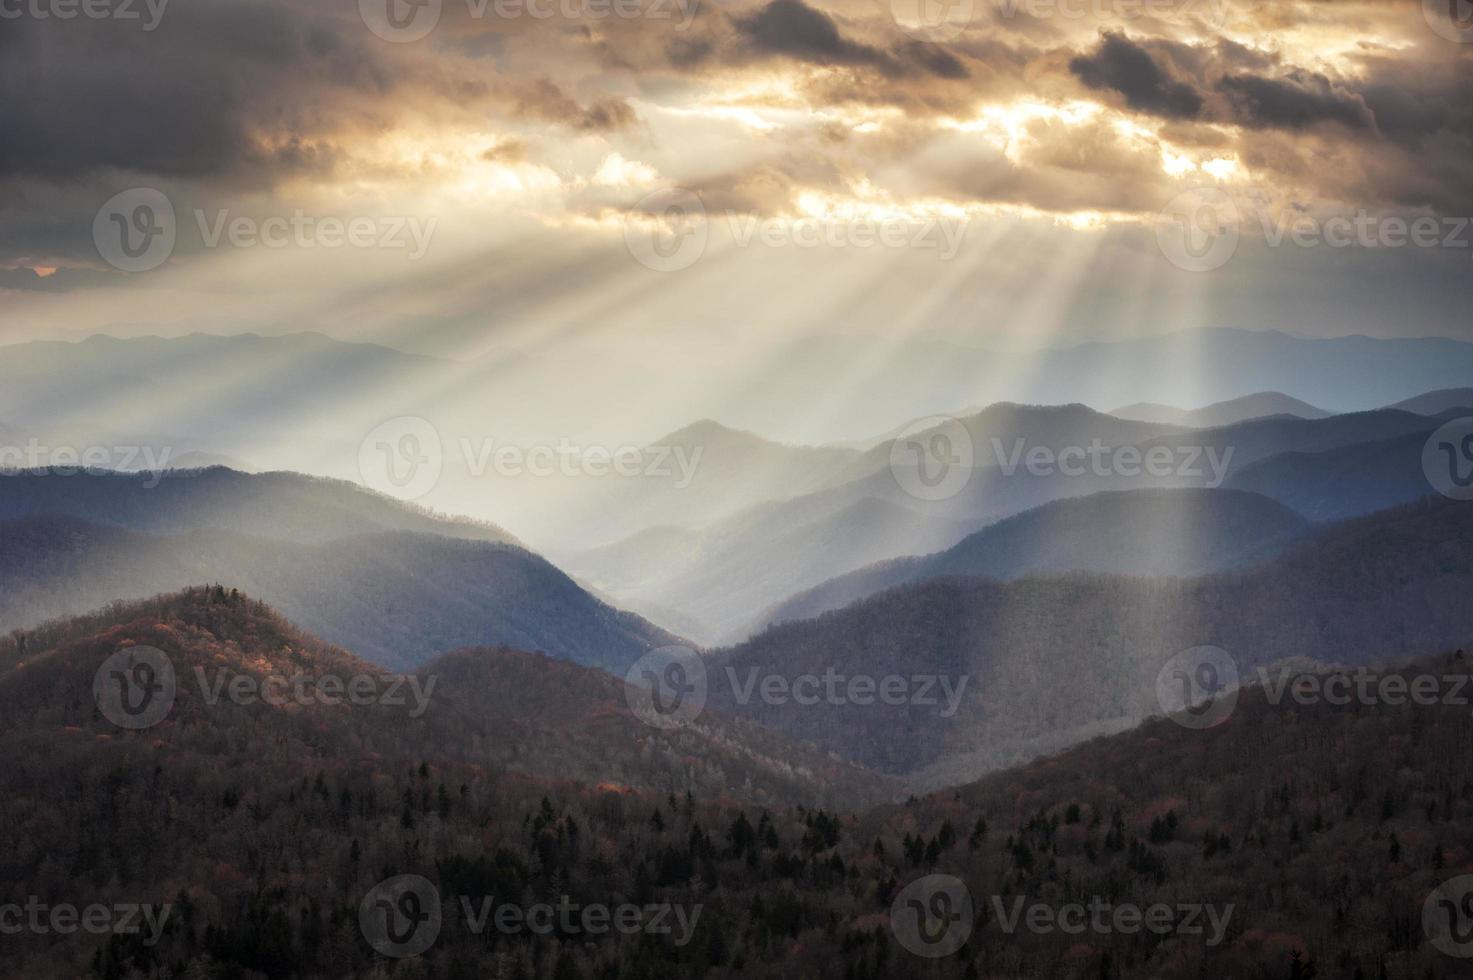 montanhas apalaches raios de luz crepuscular nas cristas da estrada azul foto